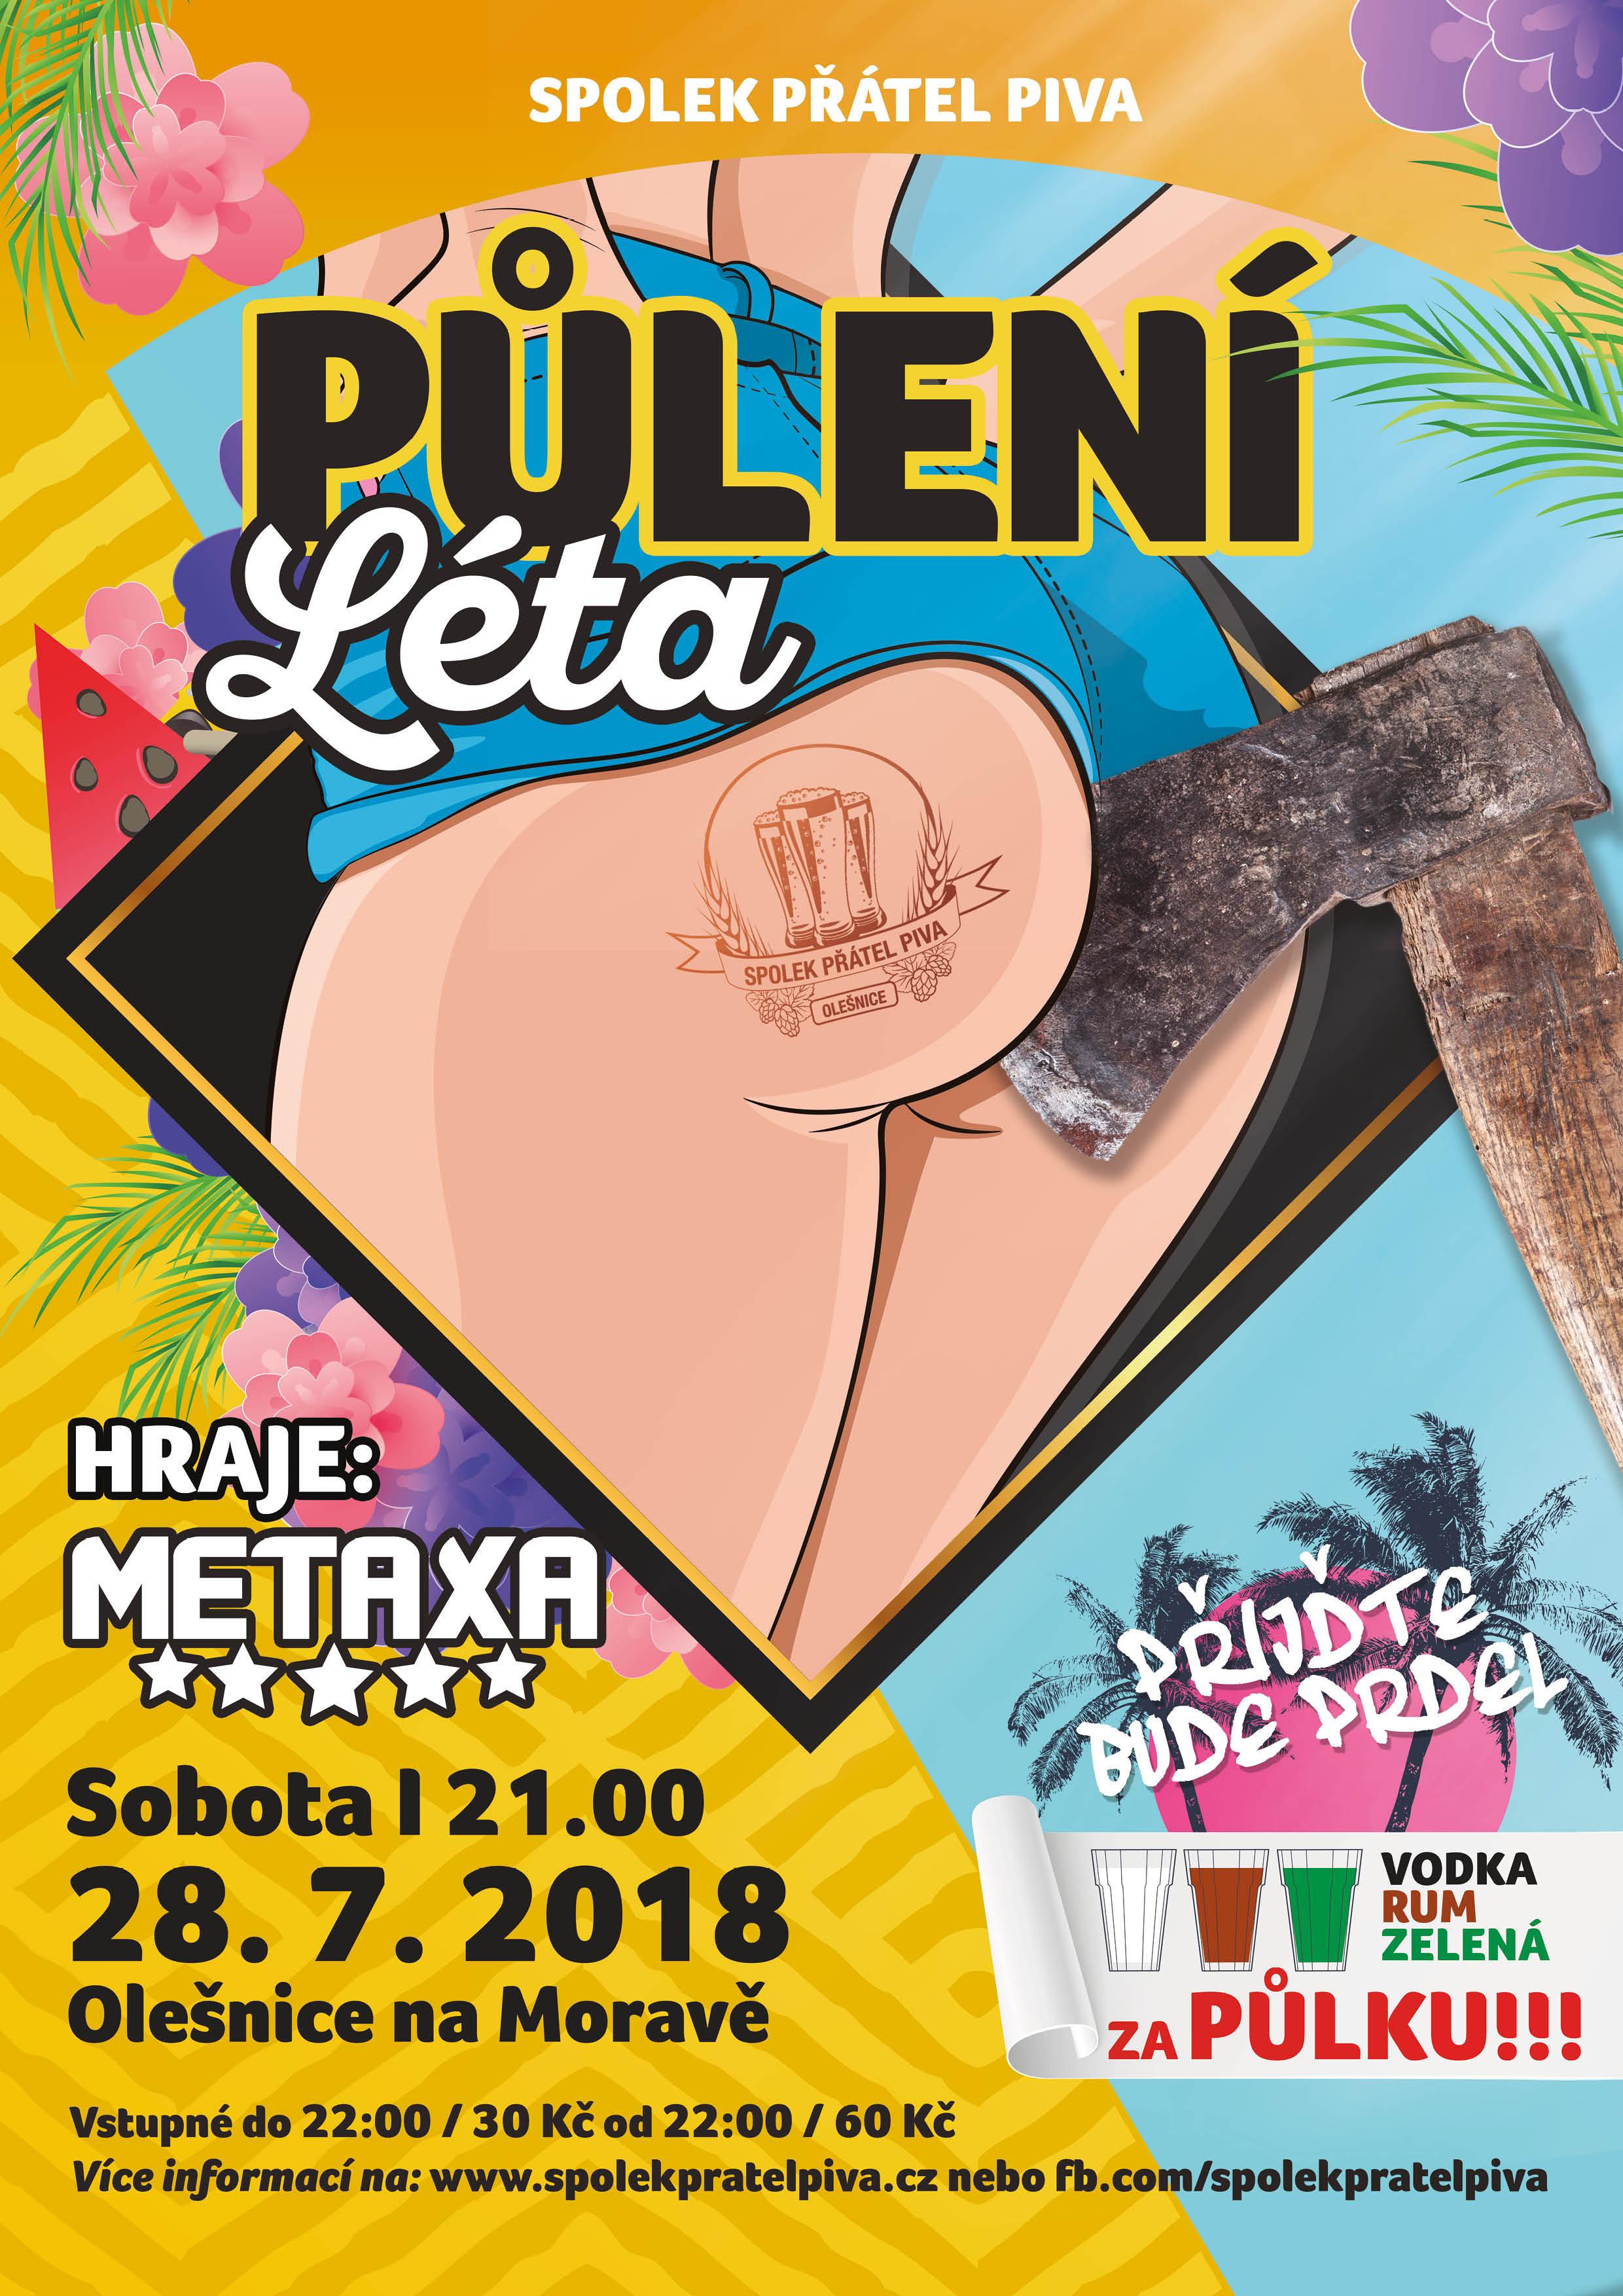 SPP_POSTER_PULENI LETA_2018_NAHLED_WEB